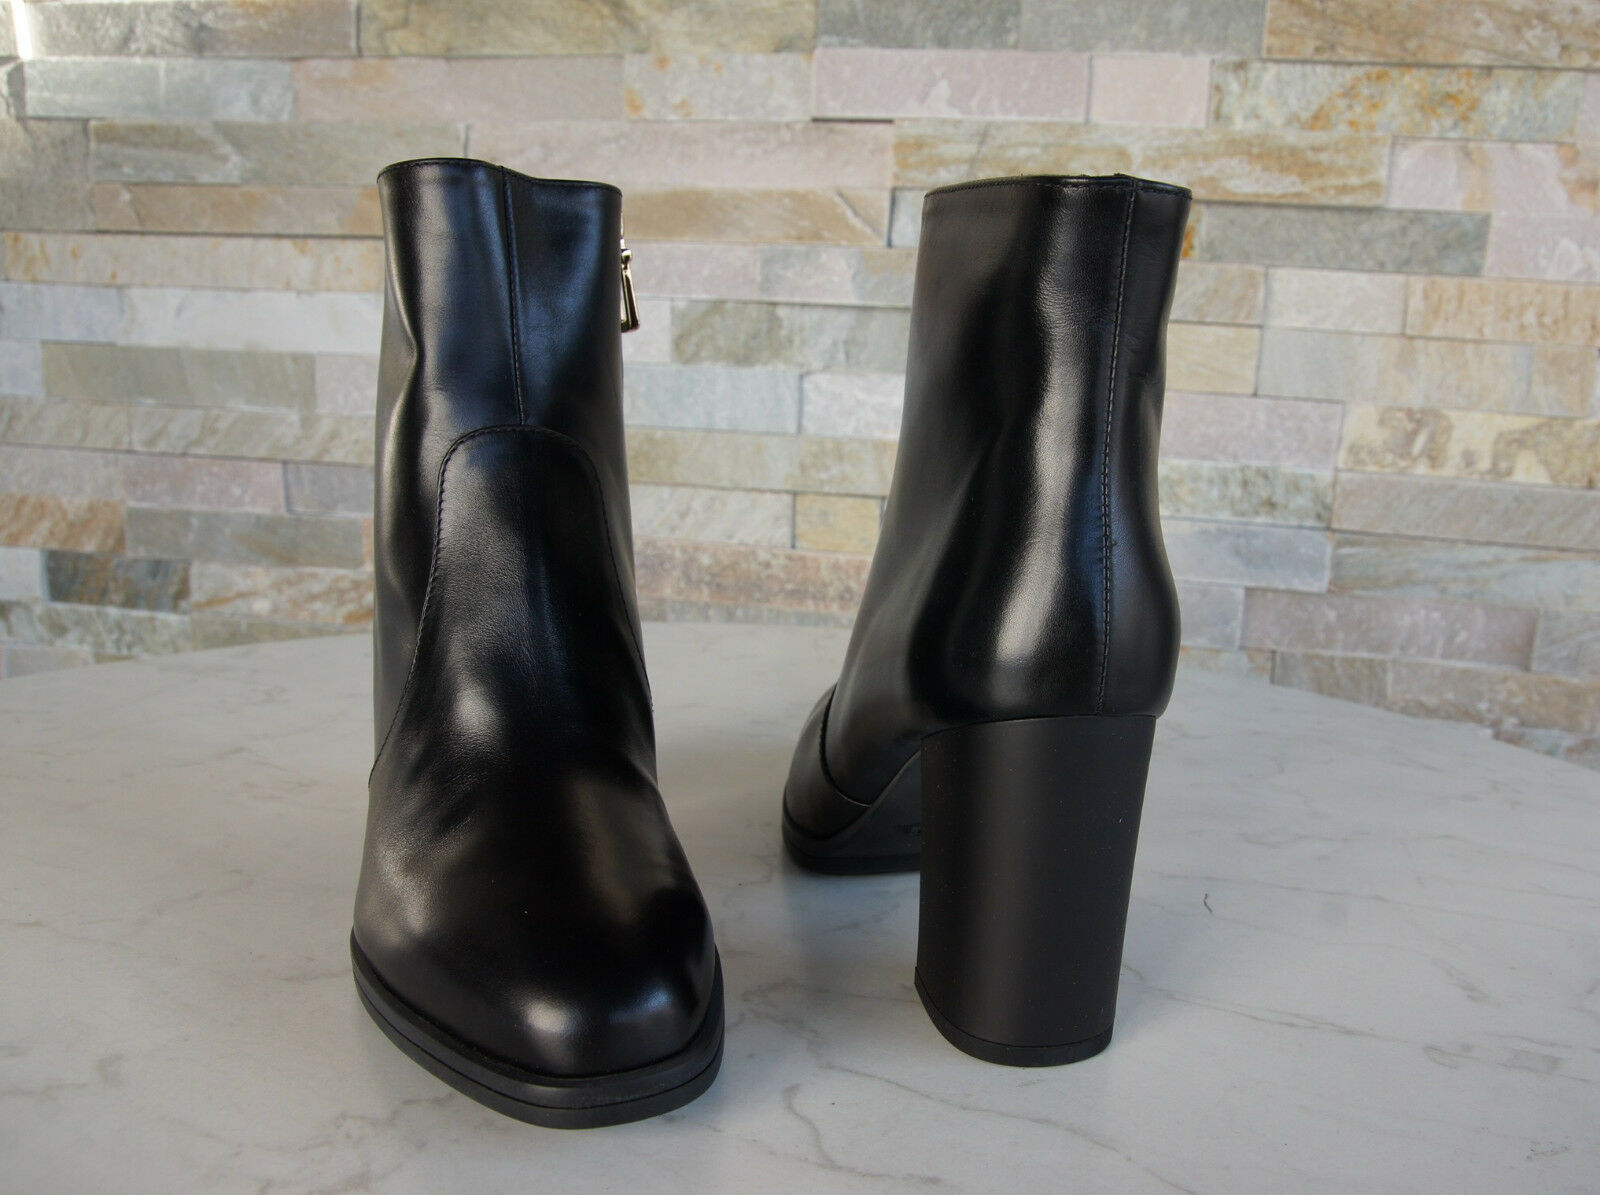 Tods Tod´s Stiefeletten 35,5 Stiefelies Stiefel Stiefel Stiefel Schuhe schwarz neu ehem.   952928